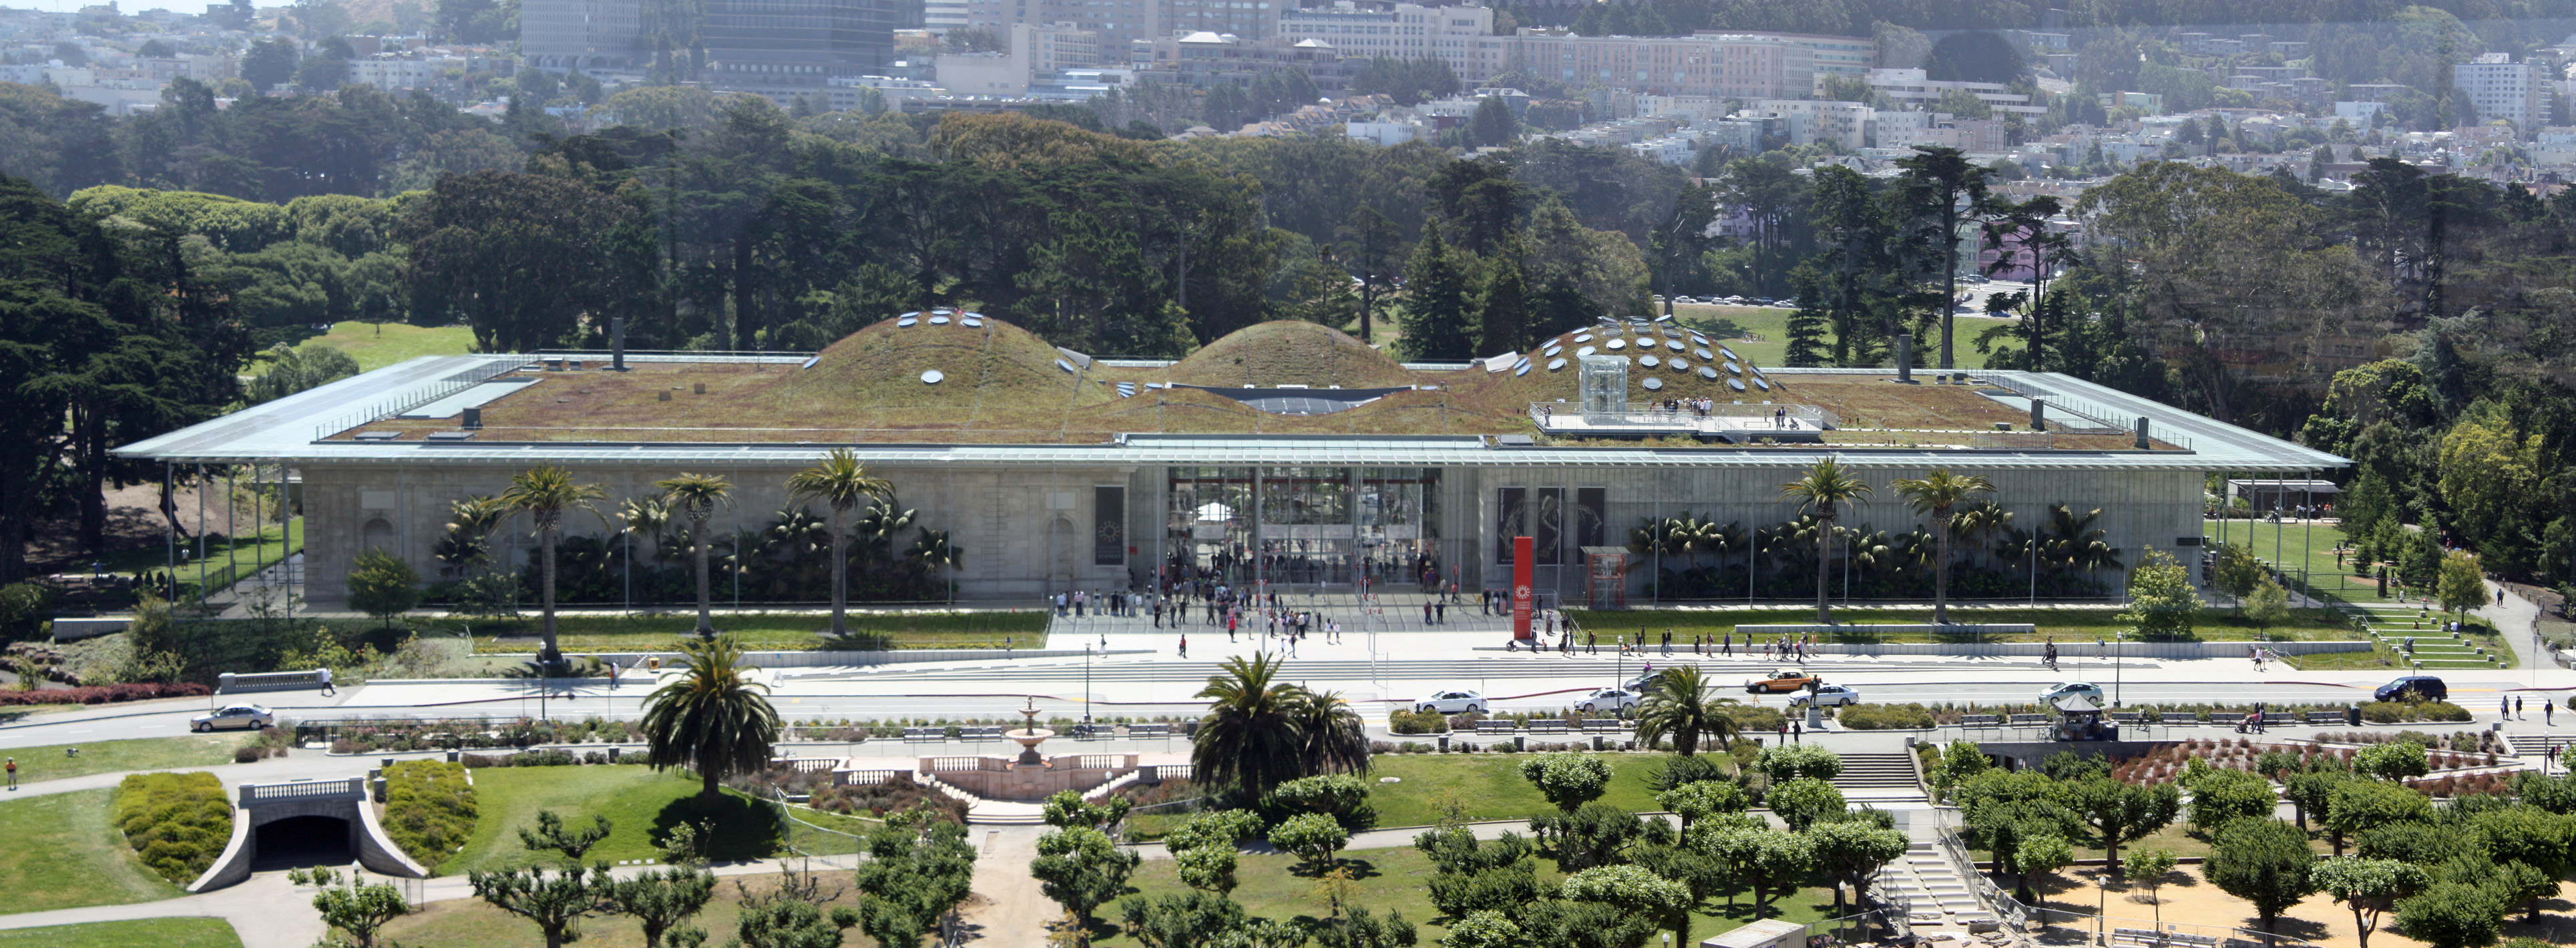 Golden Gate Park Natural History Museum